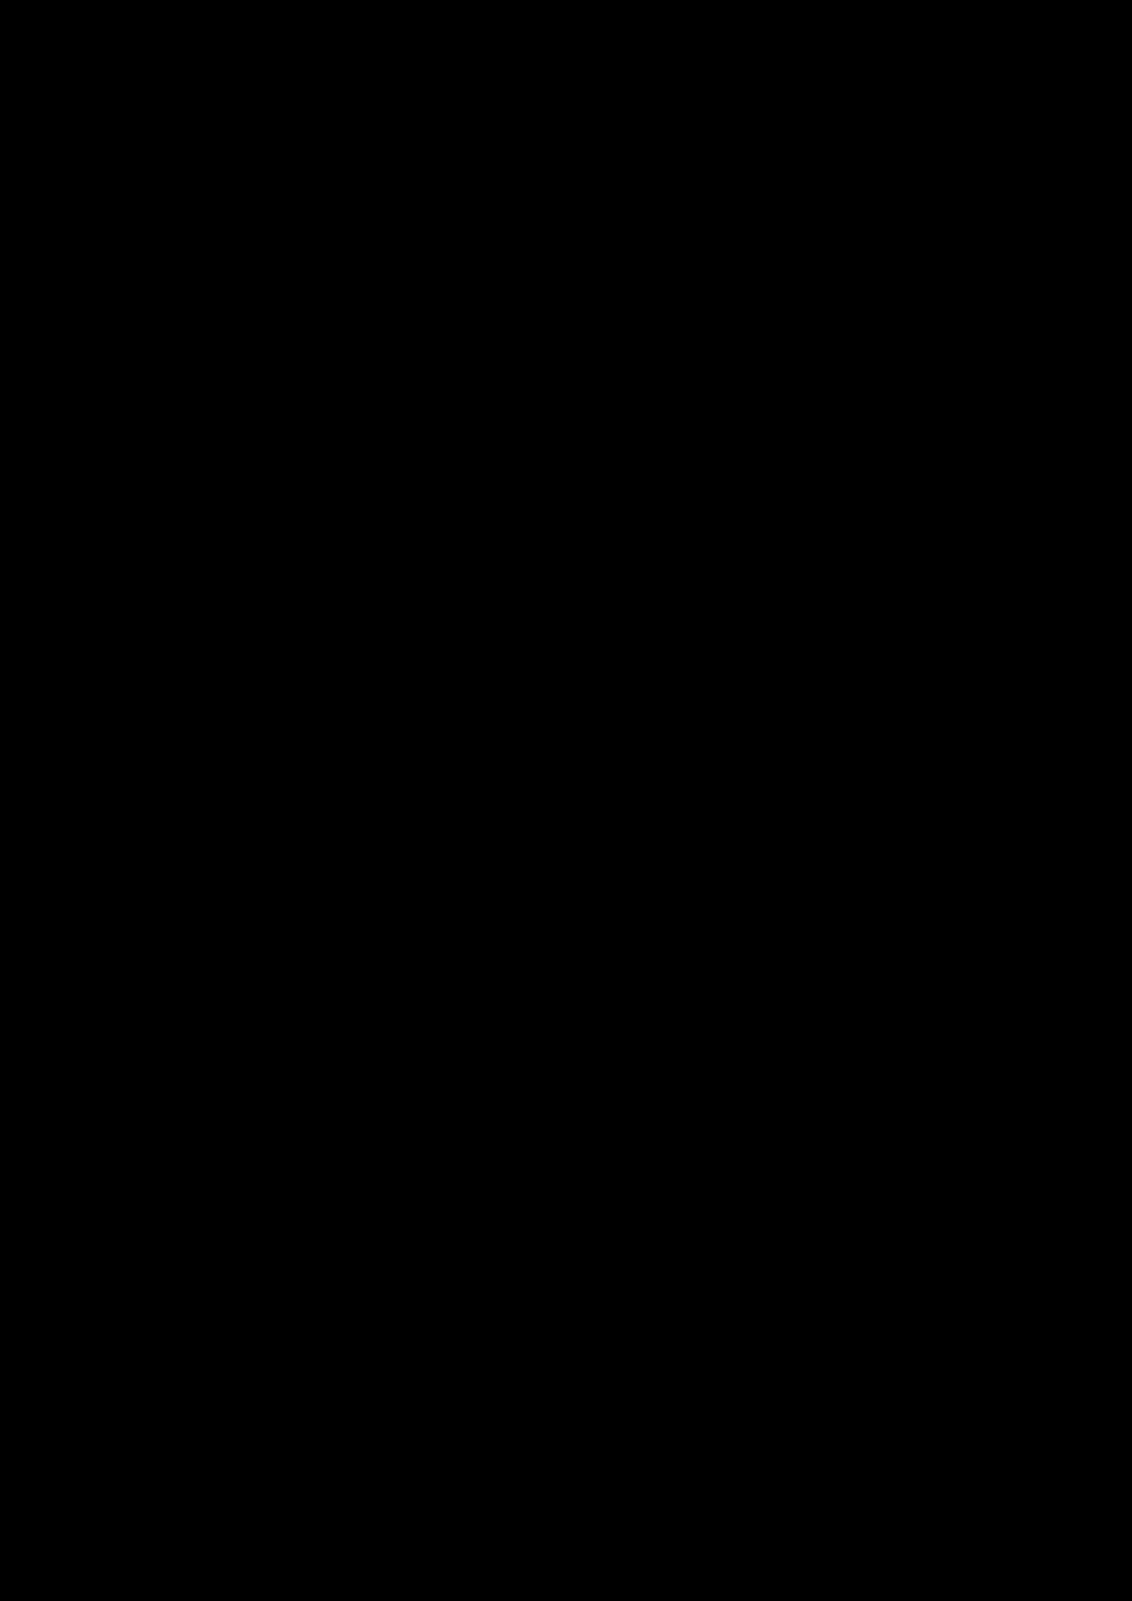 Okean Pustotyi slide, Image 8